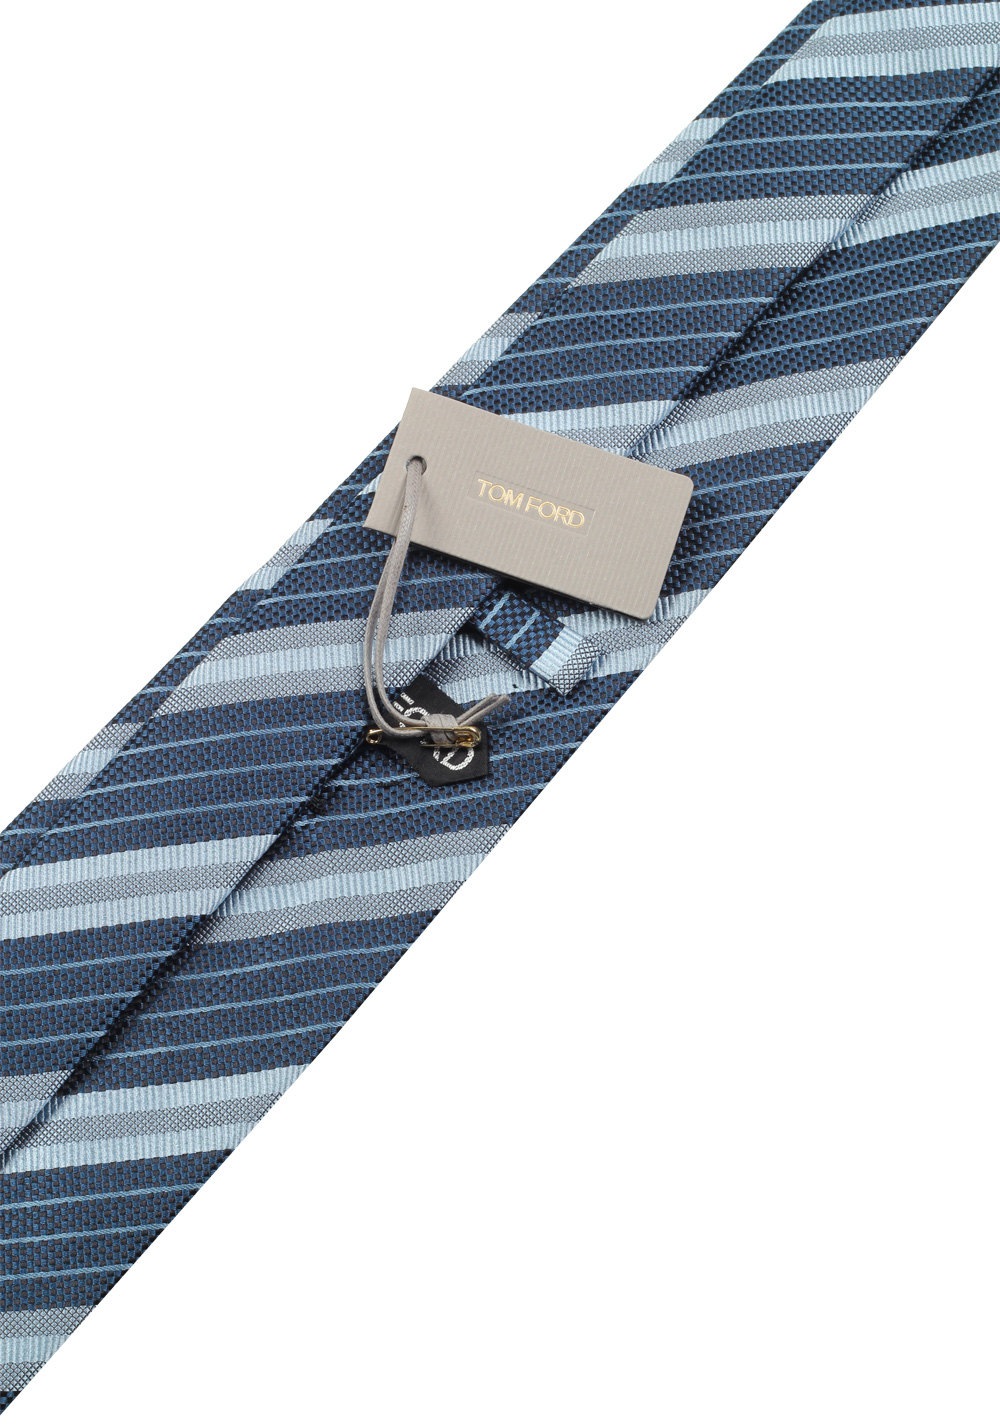 TOM FORD Striped Blue Tie In Silk | Costume Limité